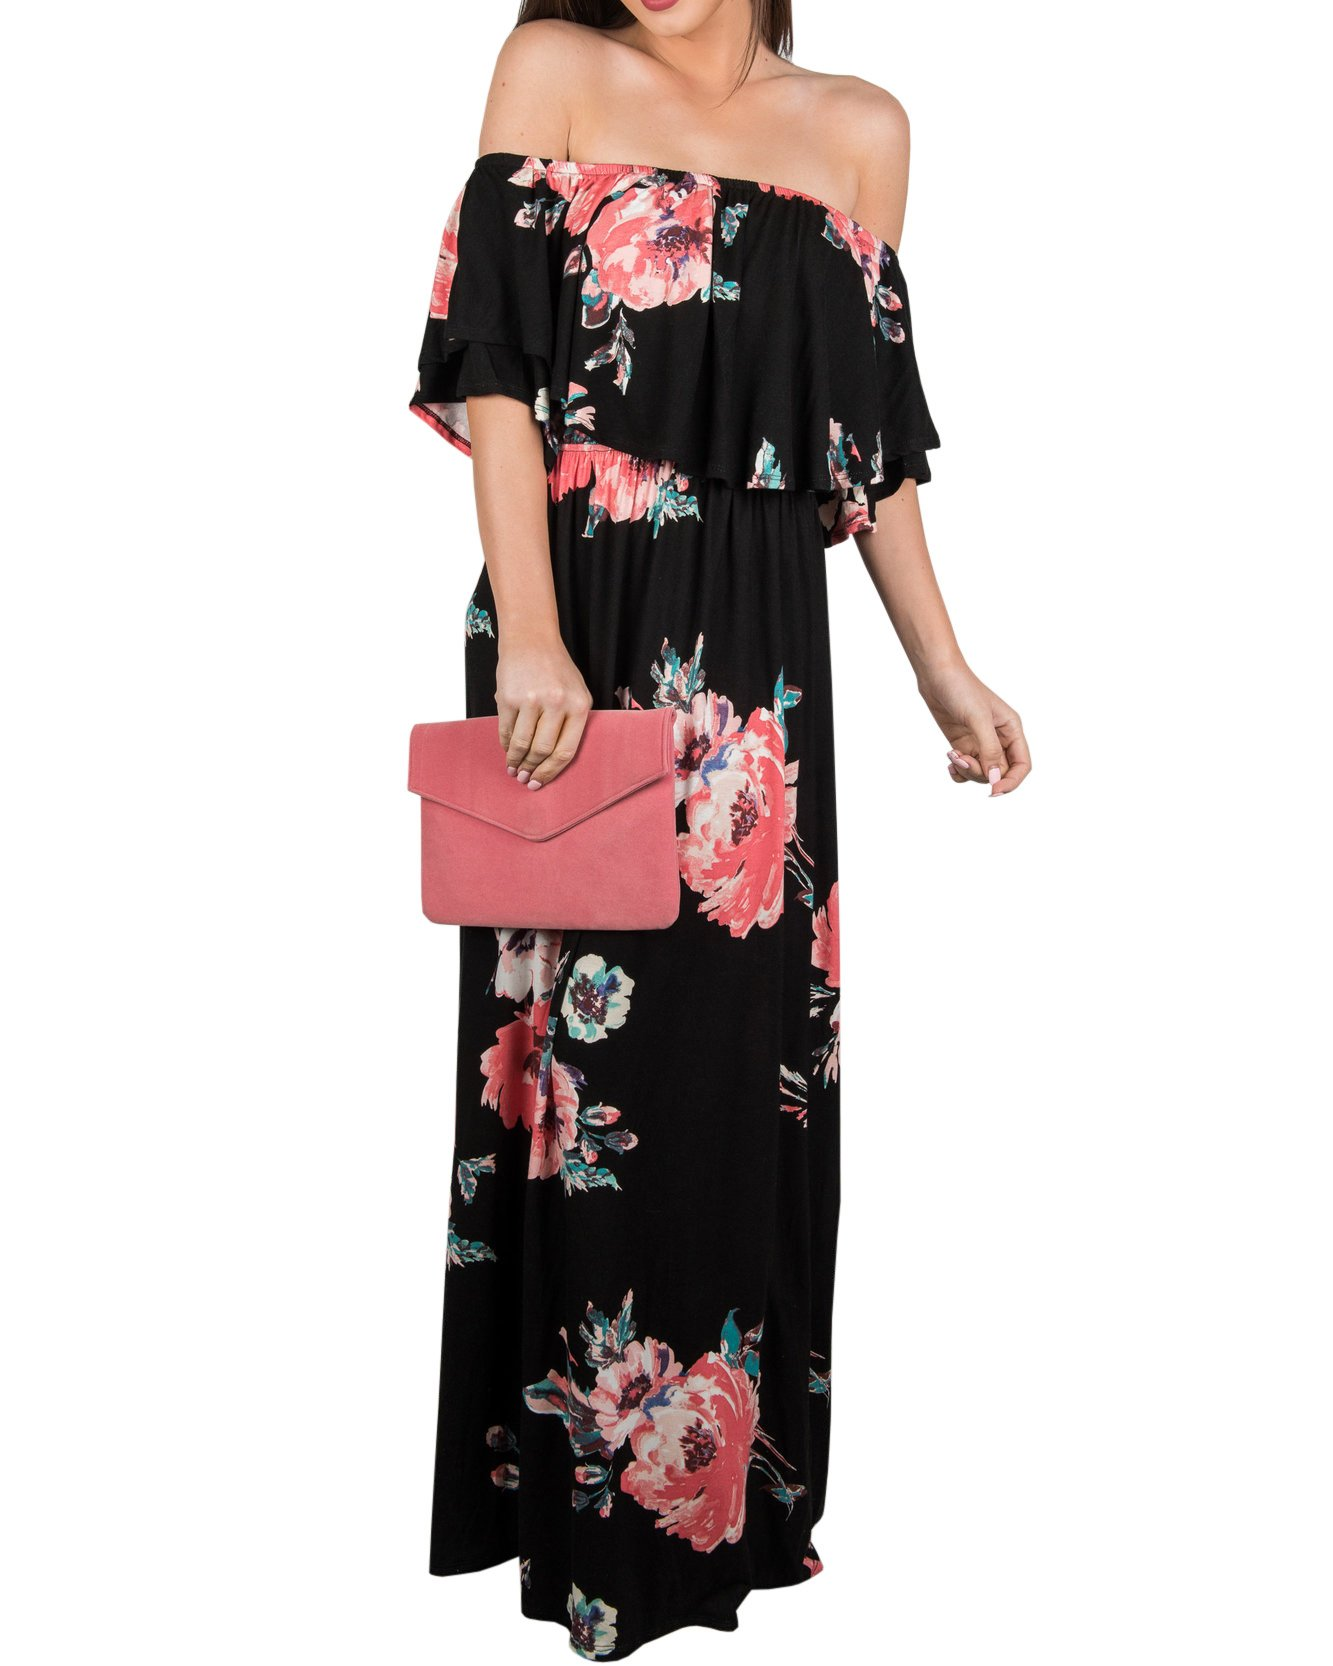 Chuanqi Womens Summer Floral Off The Shoulder Dresses Causal Flowy Beach Long Maxi Dress